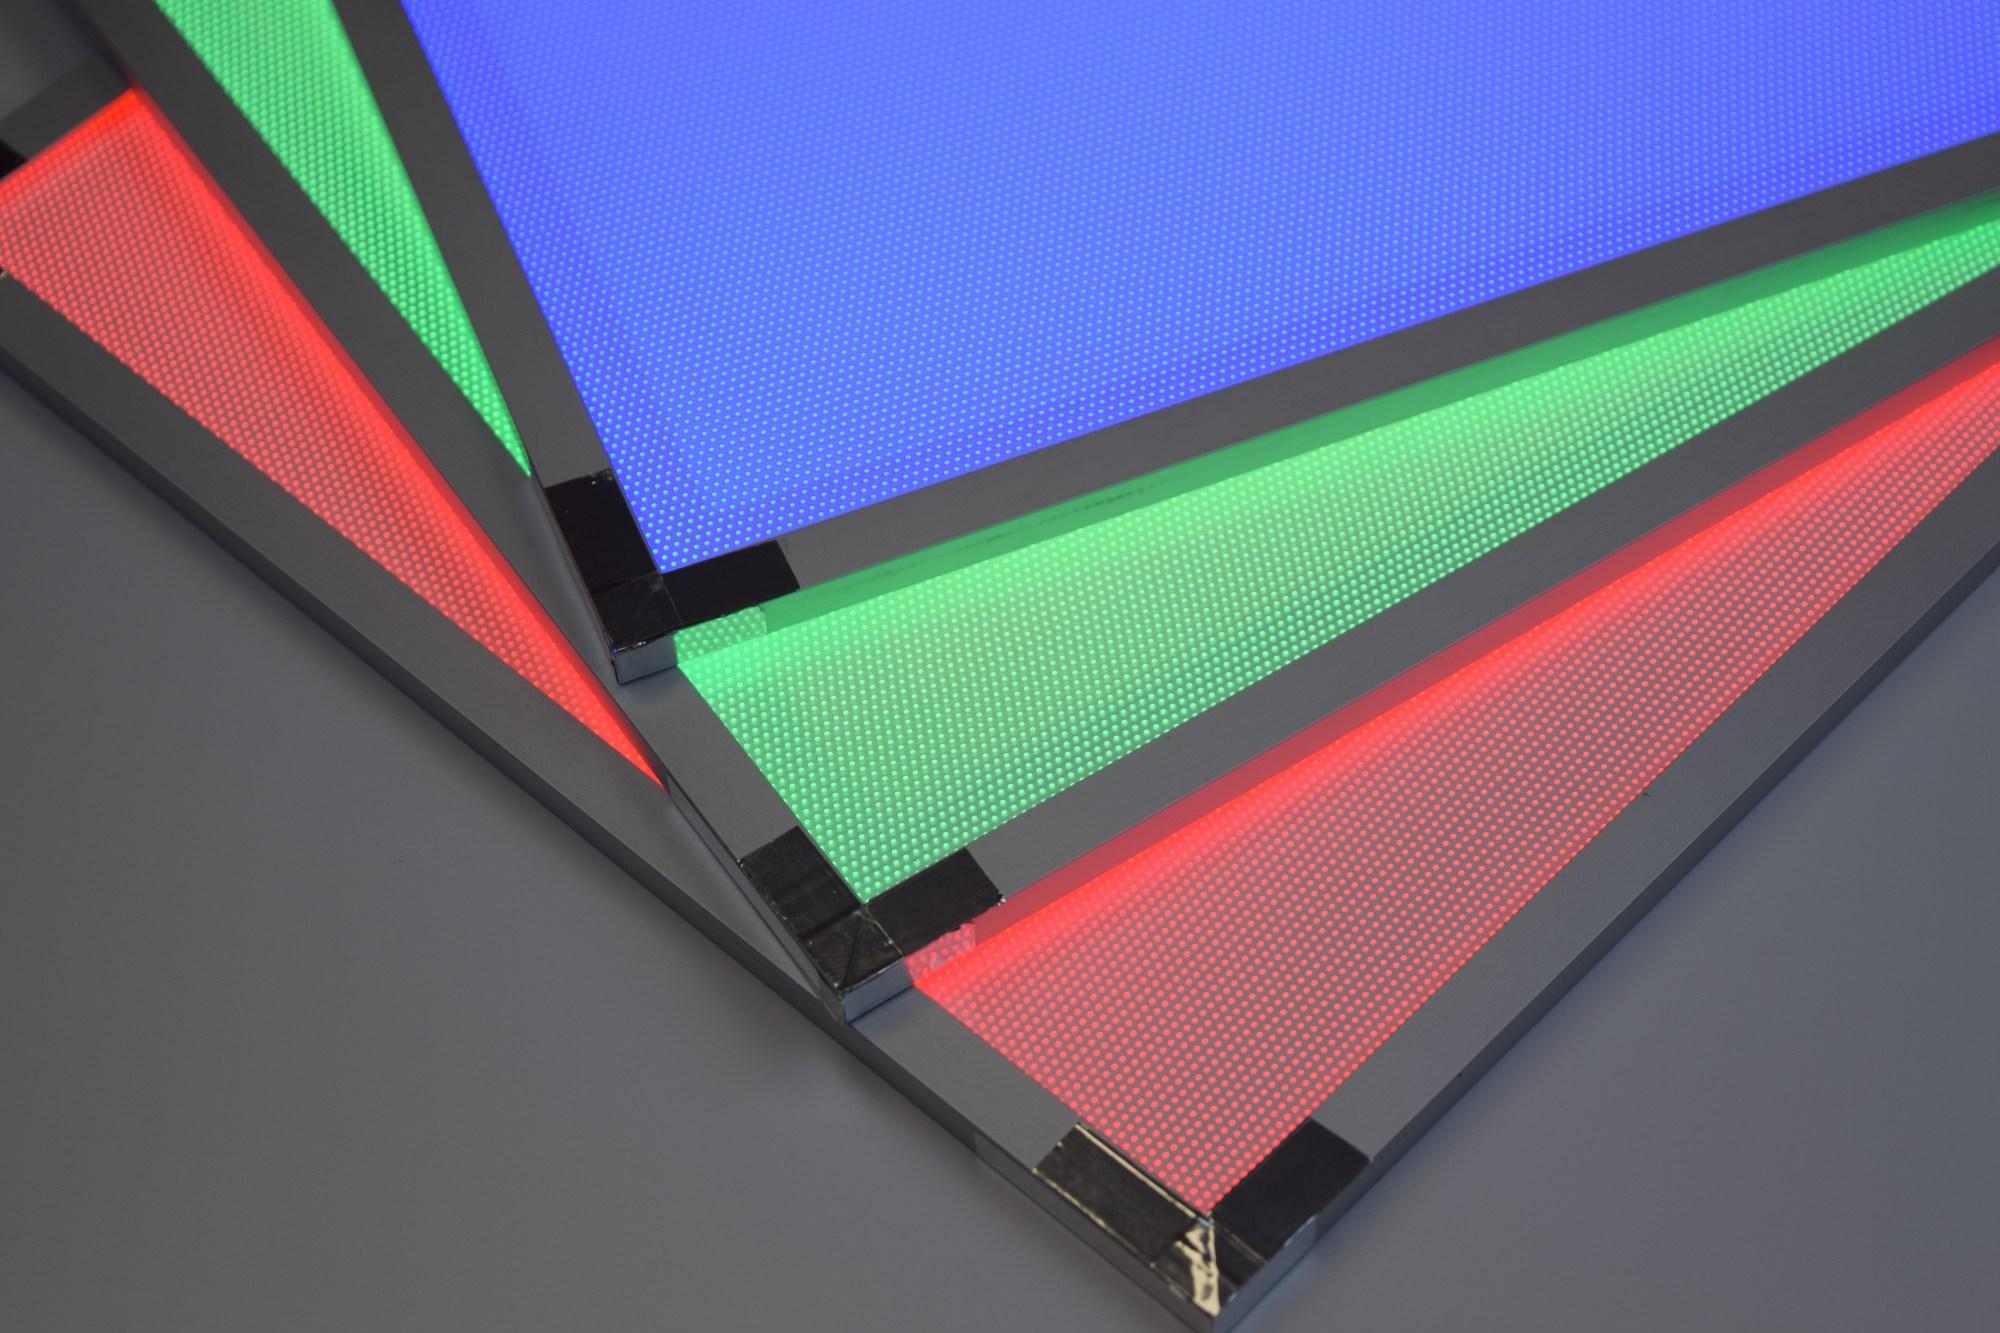 hight resolution of rgb led light guide panel lightpanel usa inc wins industry s prestigious lfi innovation award at lightfair international 2019